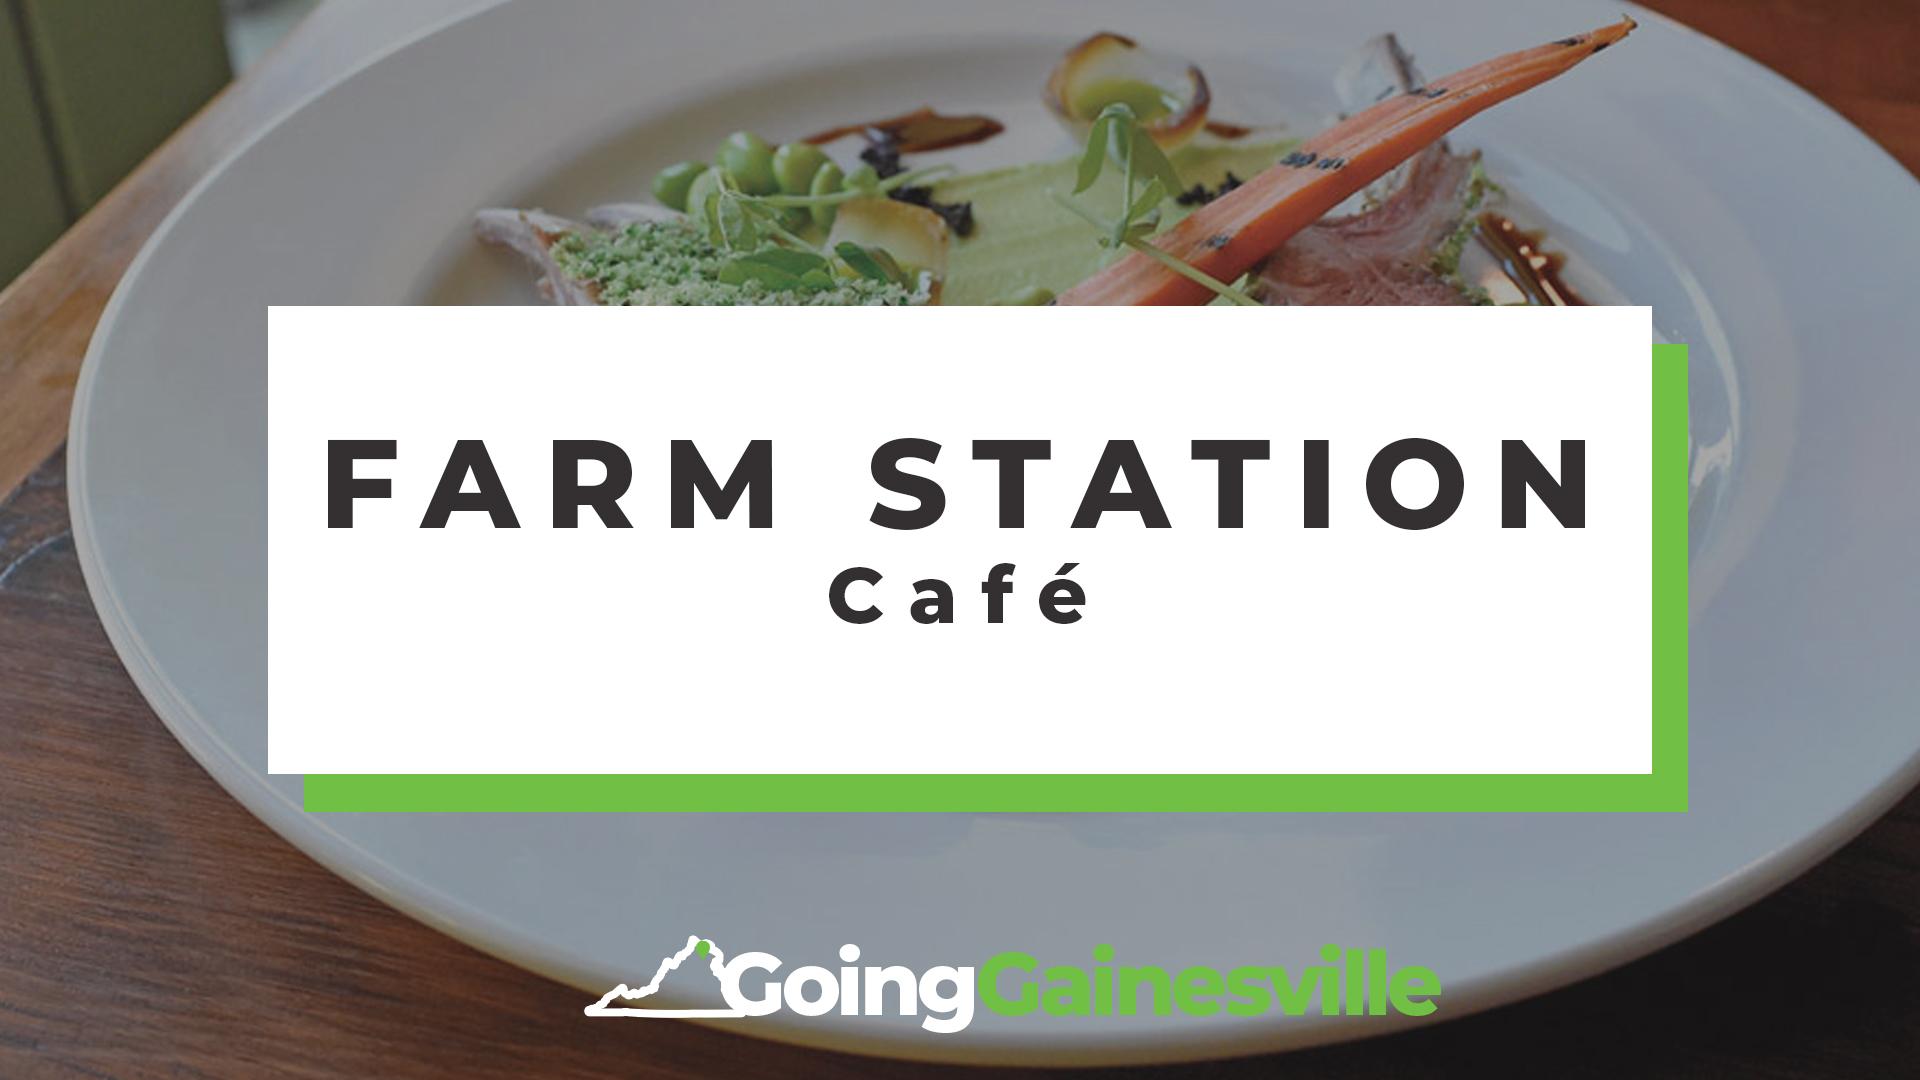 Farm Station Cafe